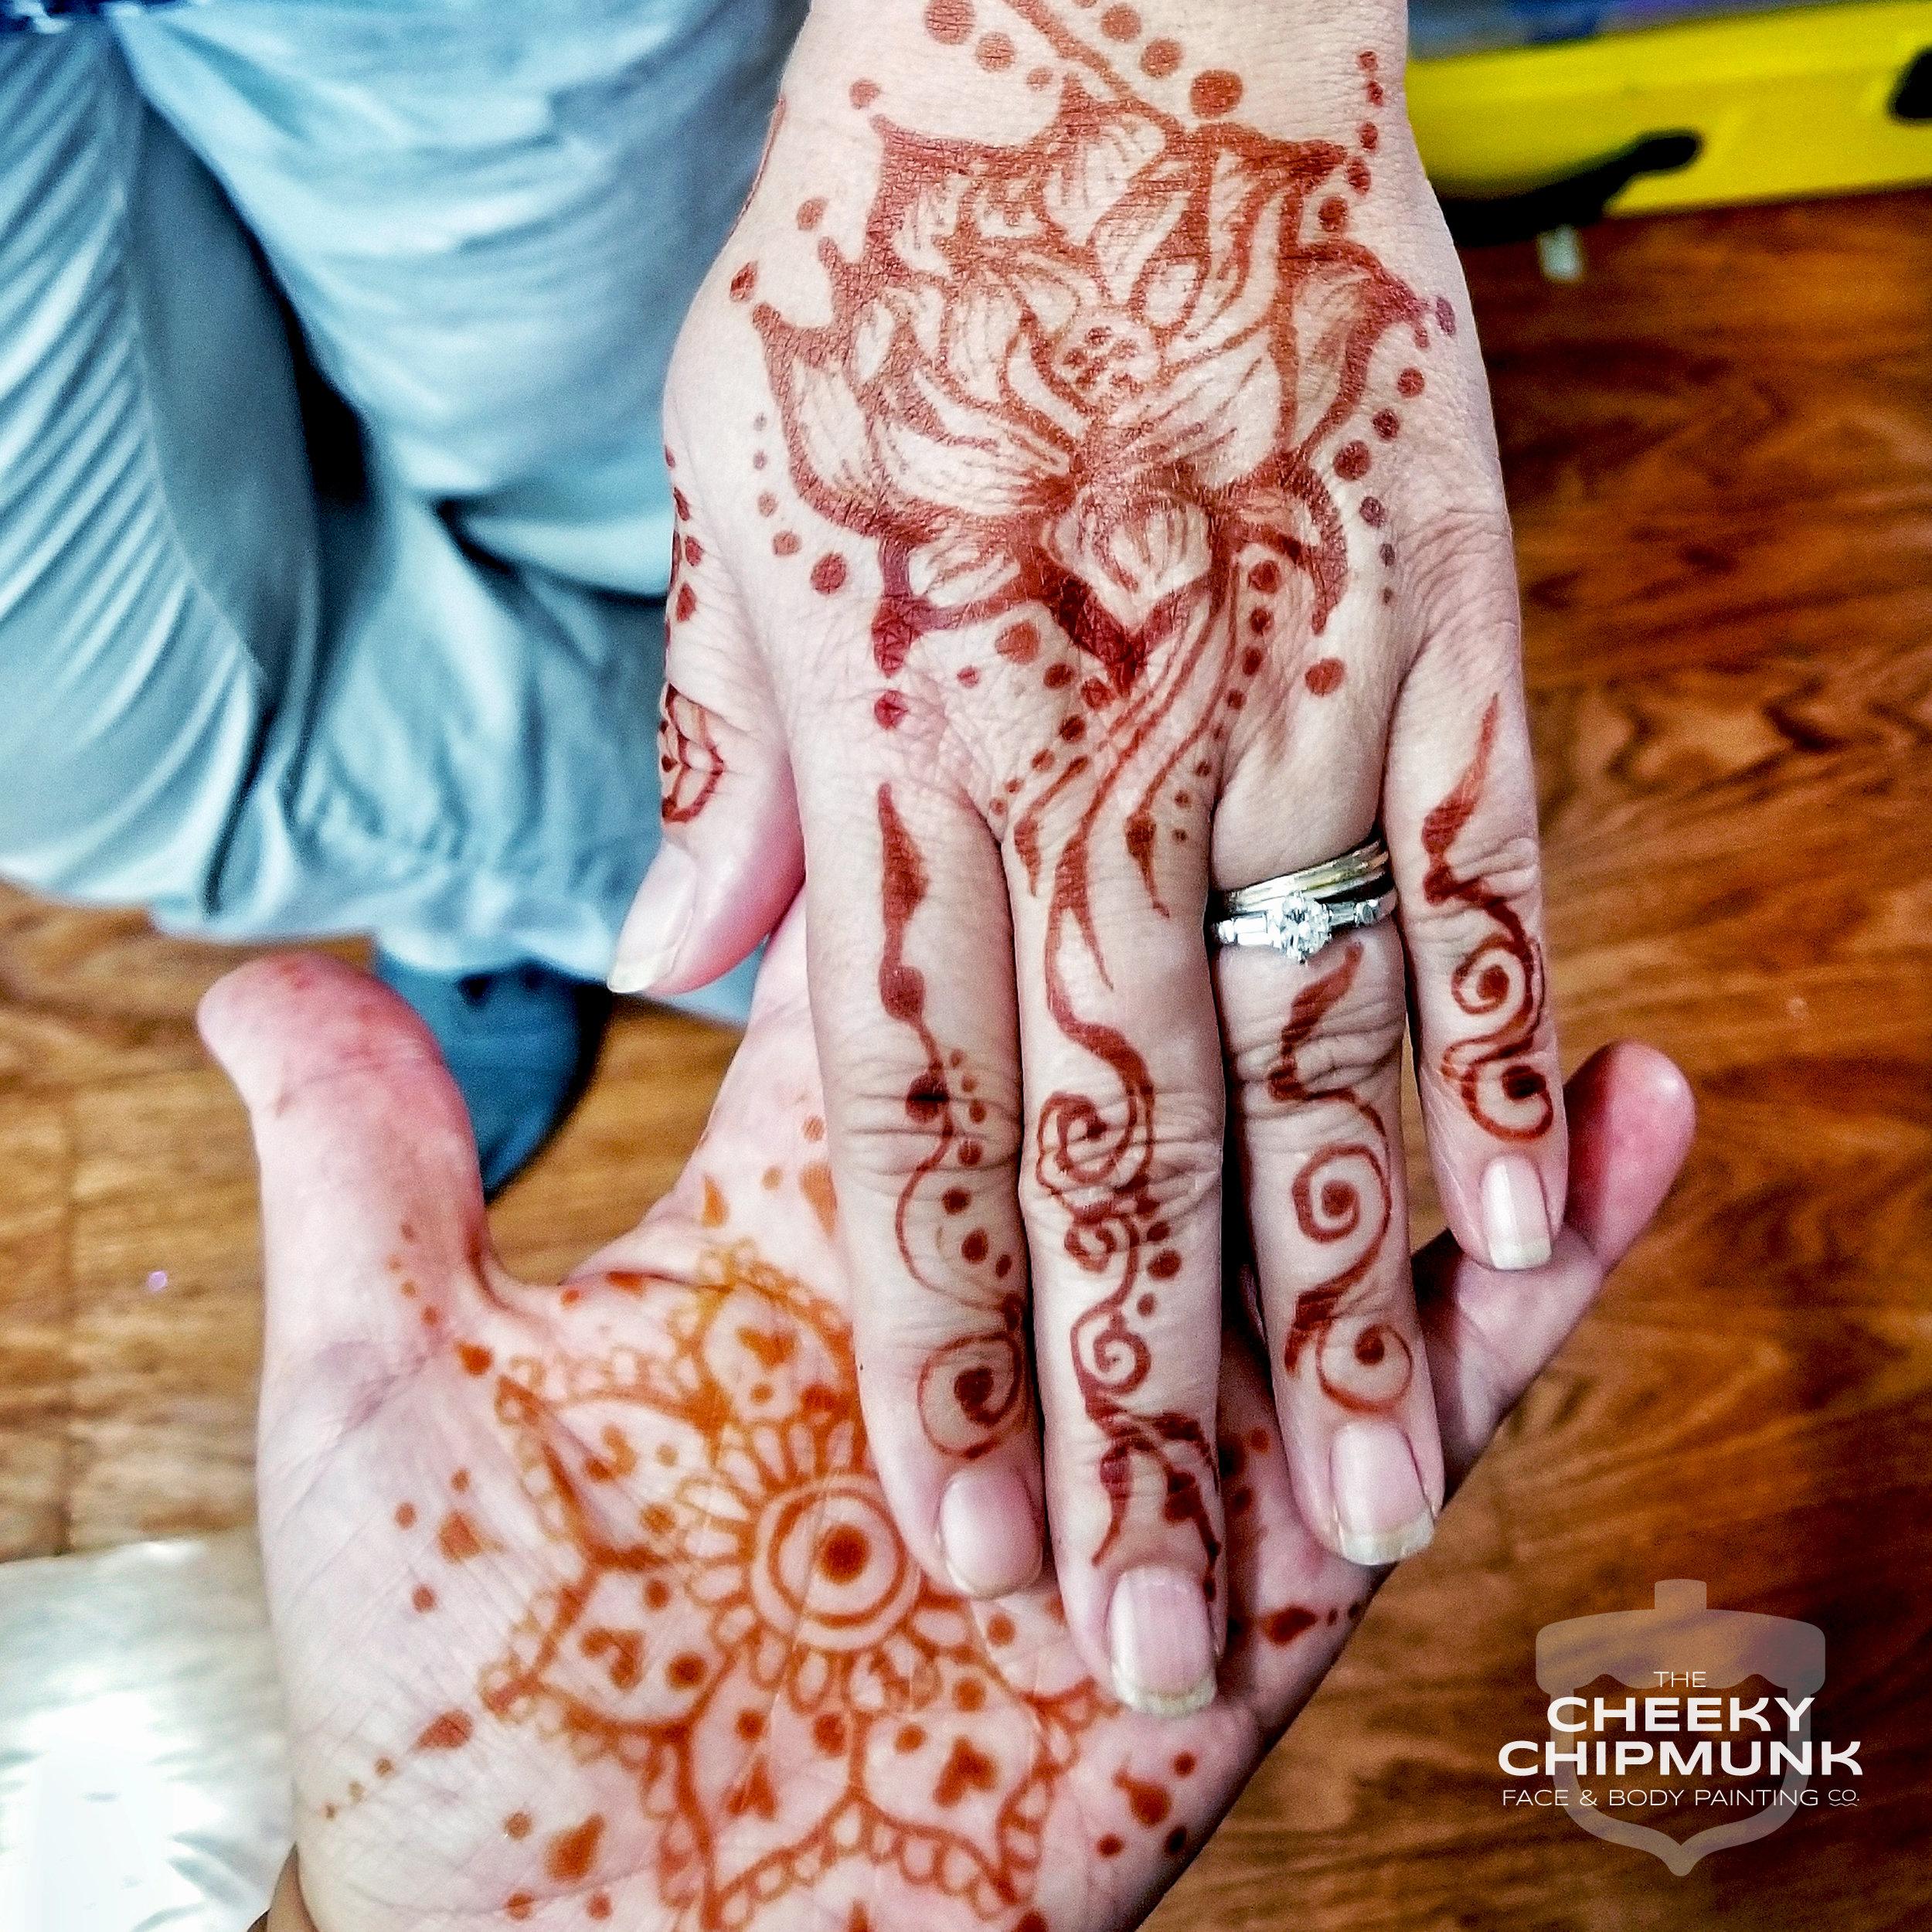 lenore-koppelman-the-cheeky-chipmunk-organic-henna-mehndi-astoria-queens-nyc-adult-teen-body-art